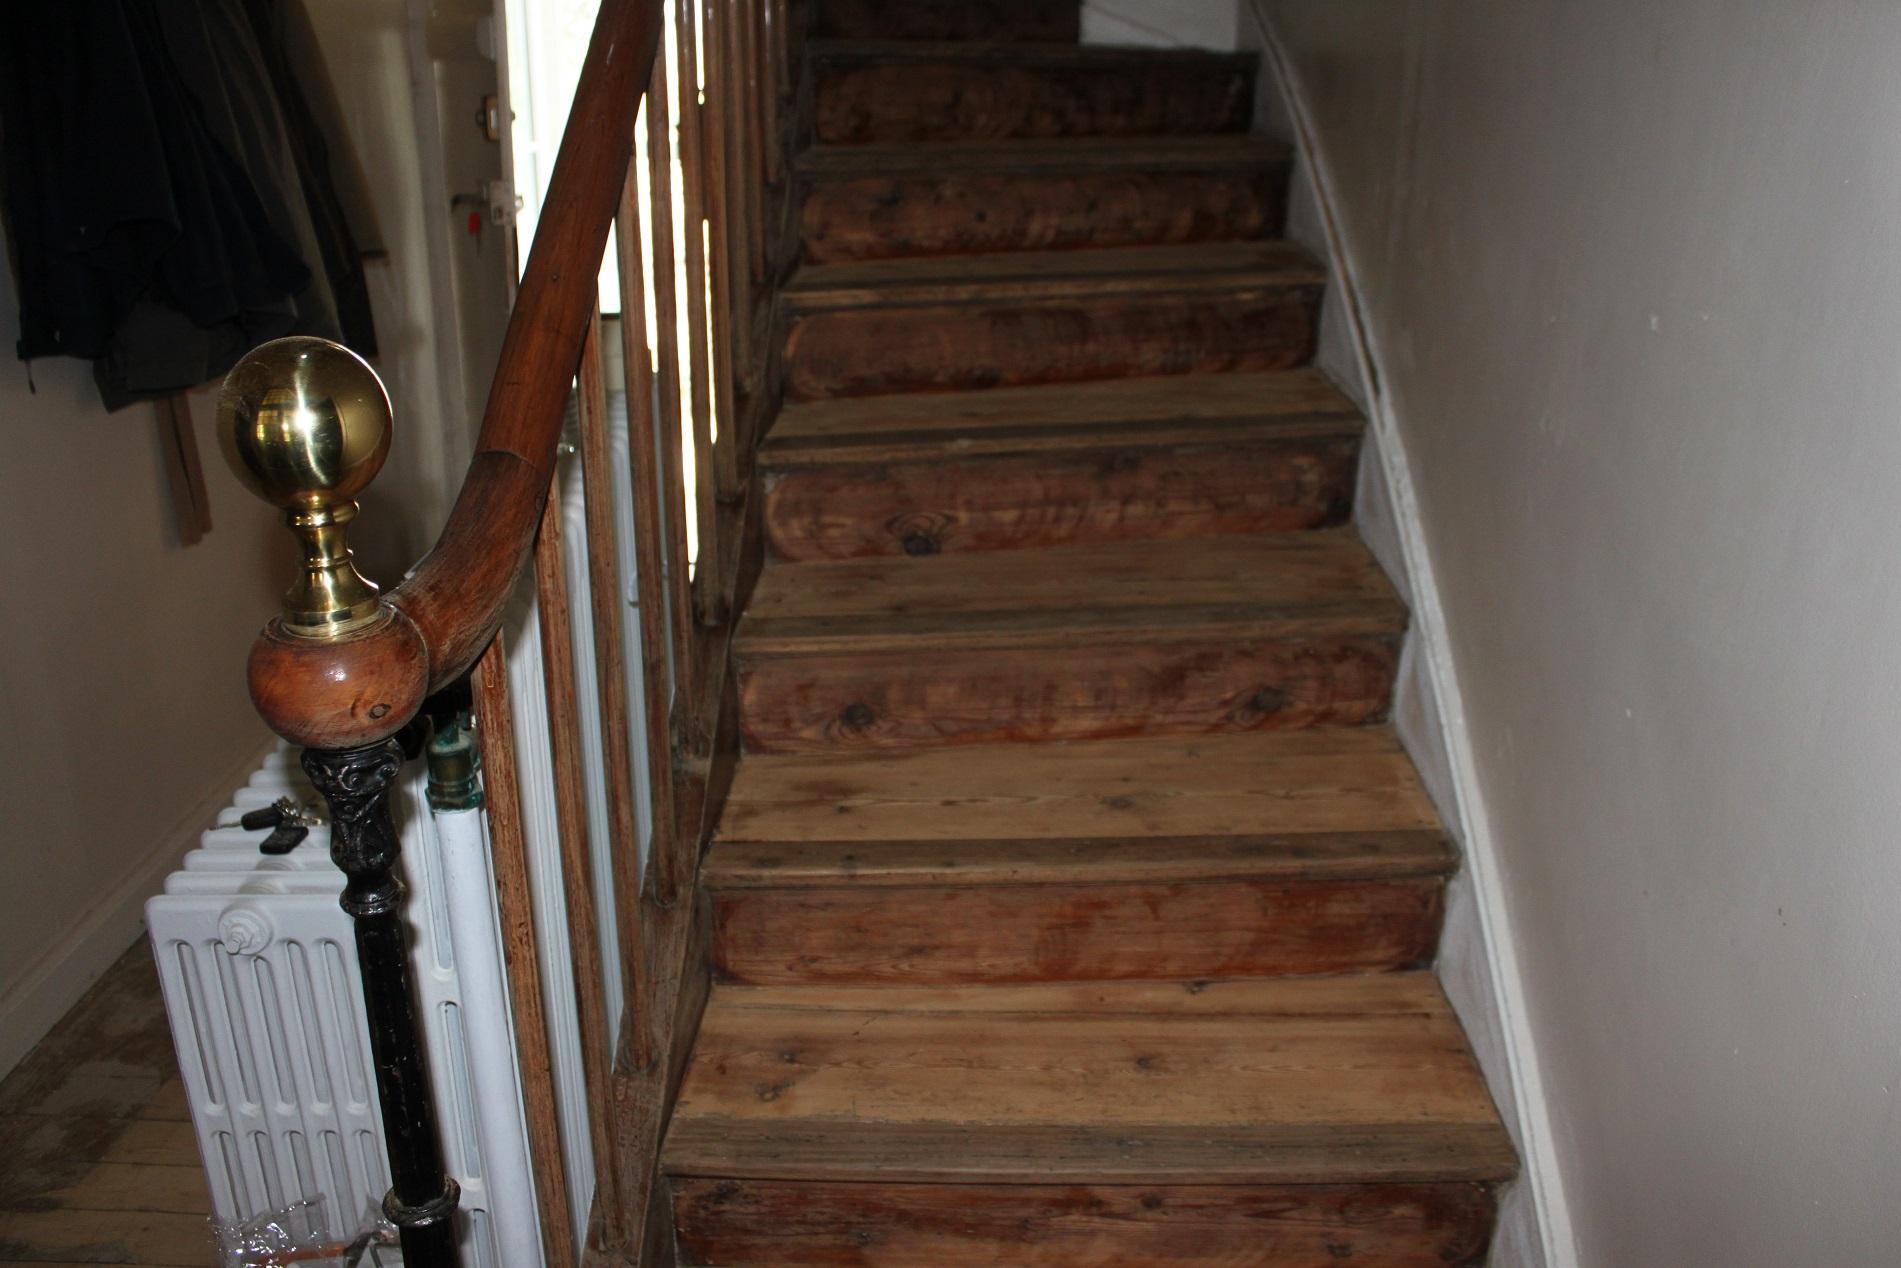 restauration d un escalier en bois de 115 ans sandrinegilbert relooking. Black Bedroom Furniture Sets. Home Design Ideas